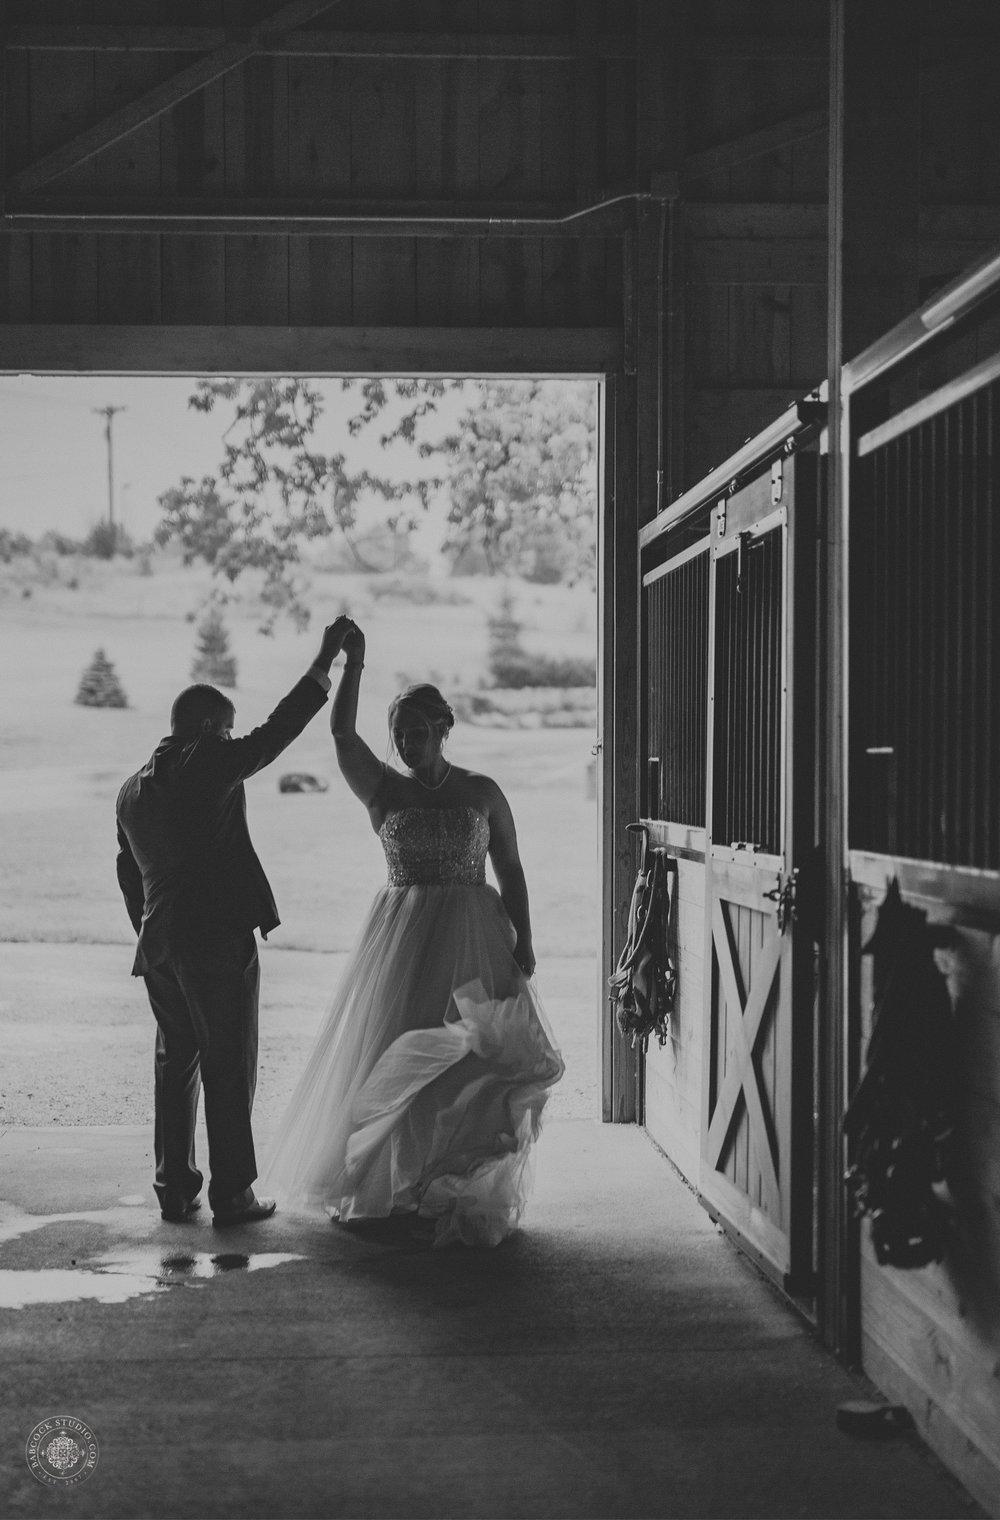 sarah-justin-canopy-creek-wedding-photographer-dayton-ohio-9.jpg